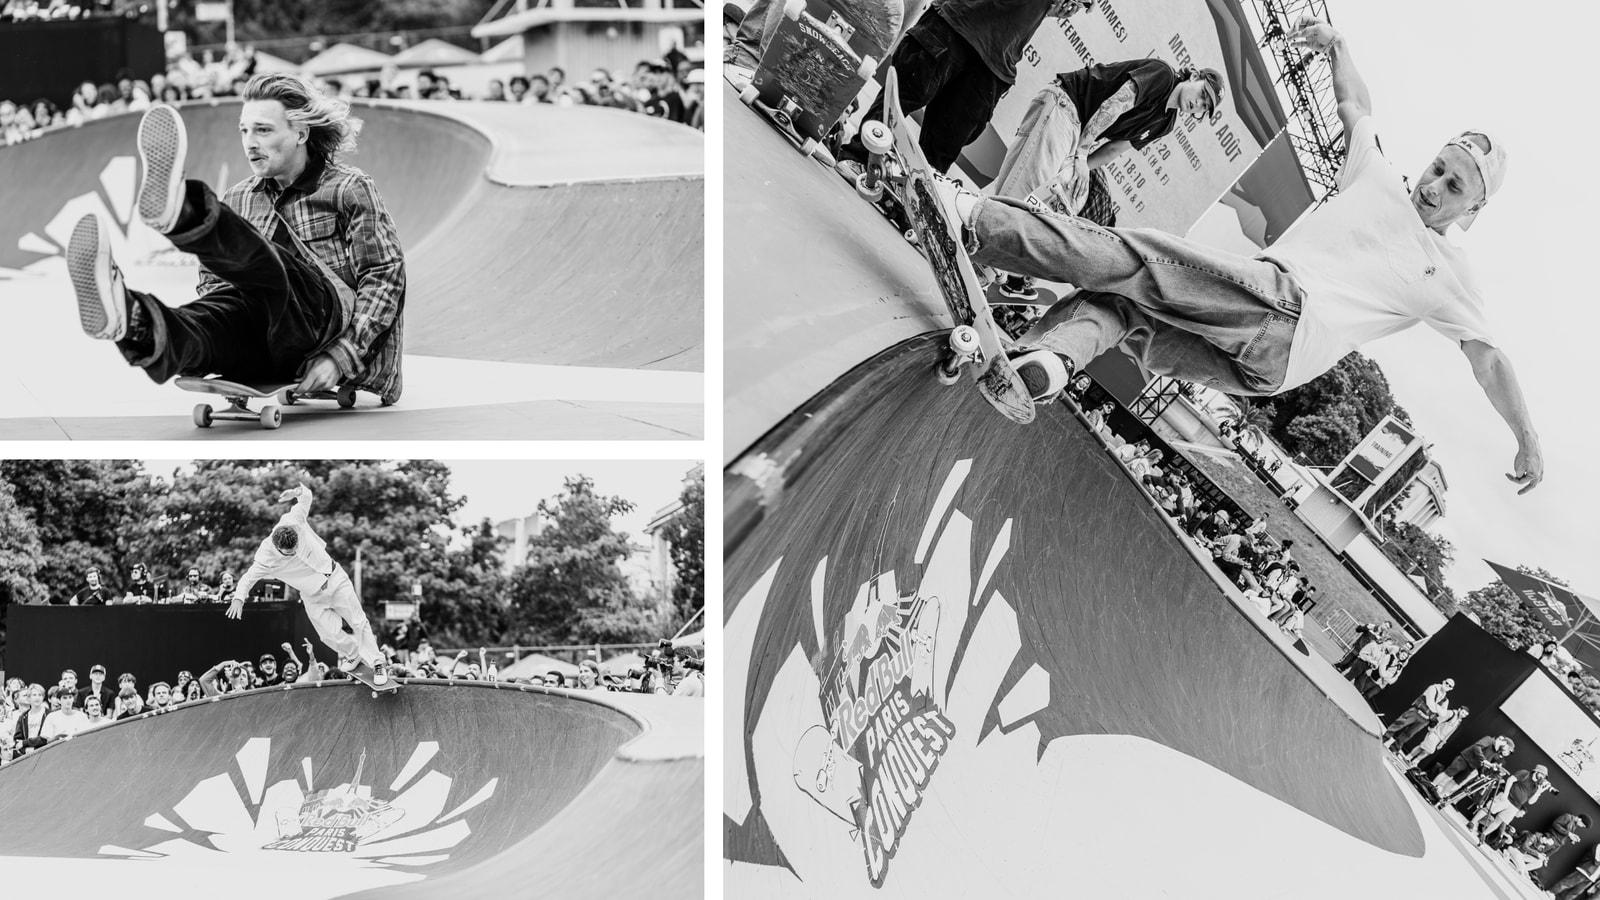 Ben's Lens: Red Bull Paris Conquest